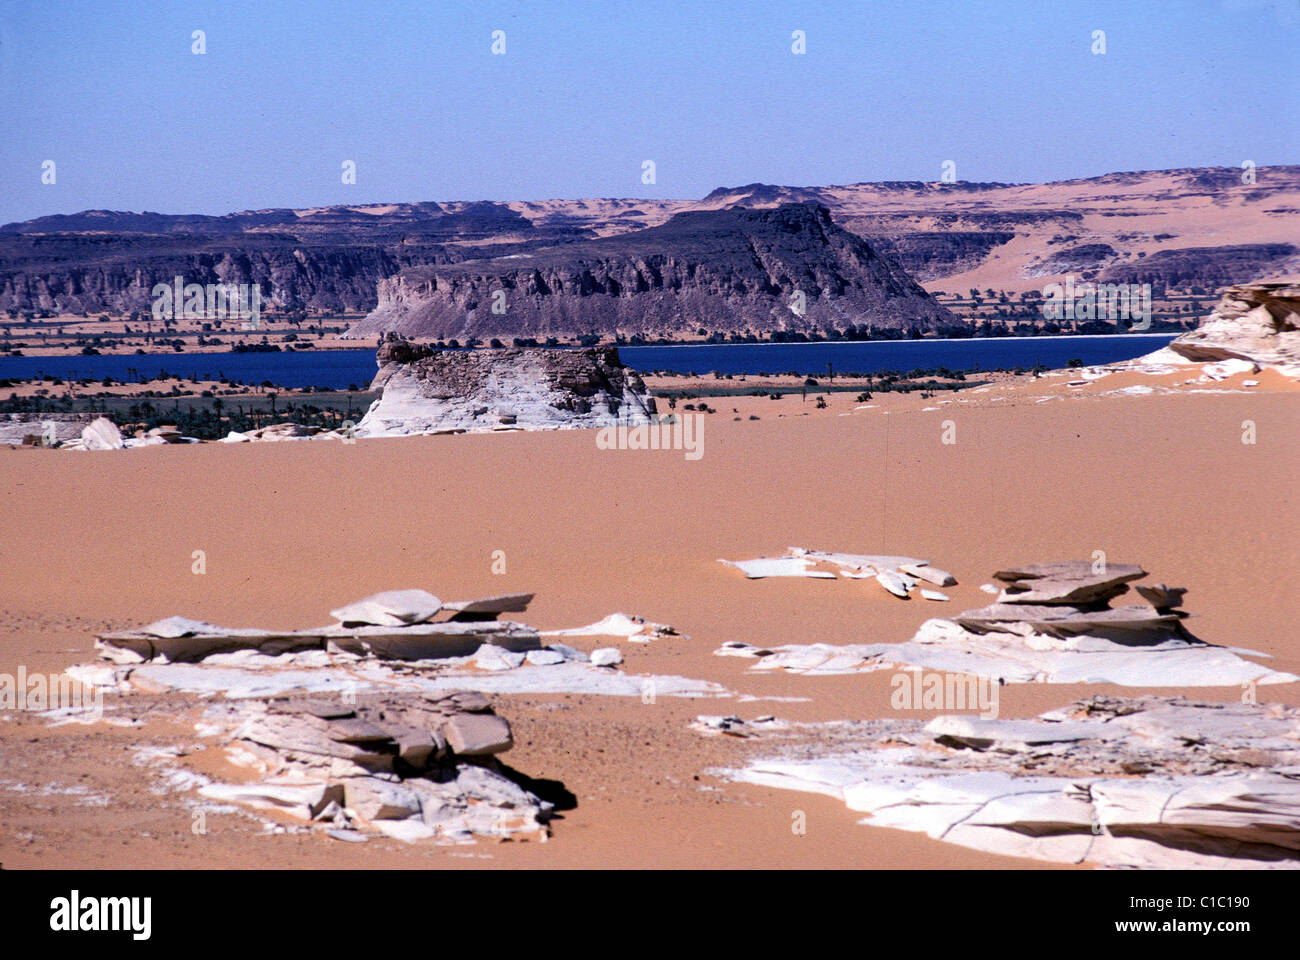 Chad, Ennedi, Lake Ounianga, Serir - Stock Image